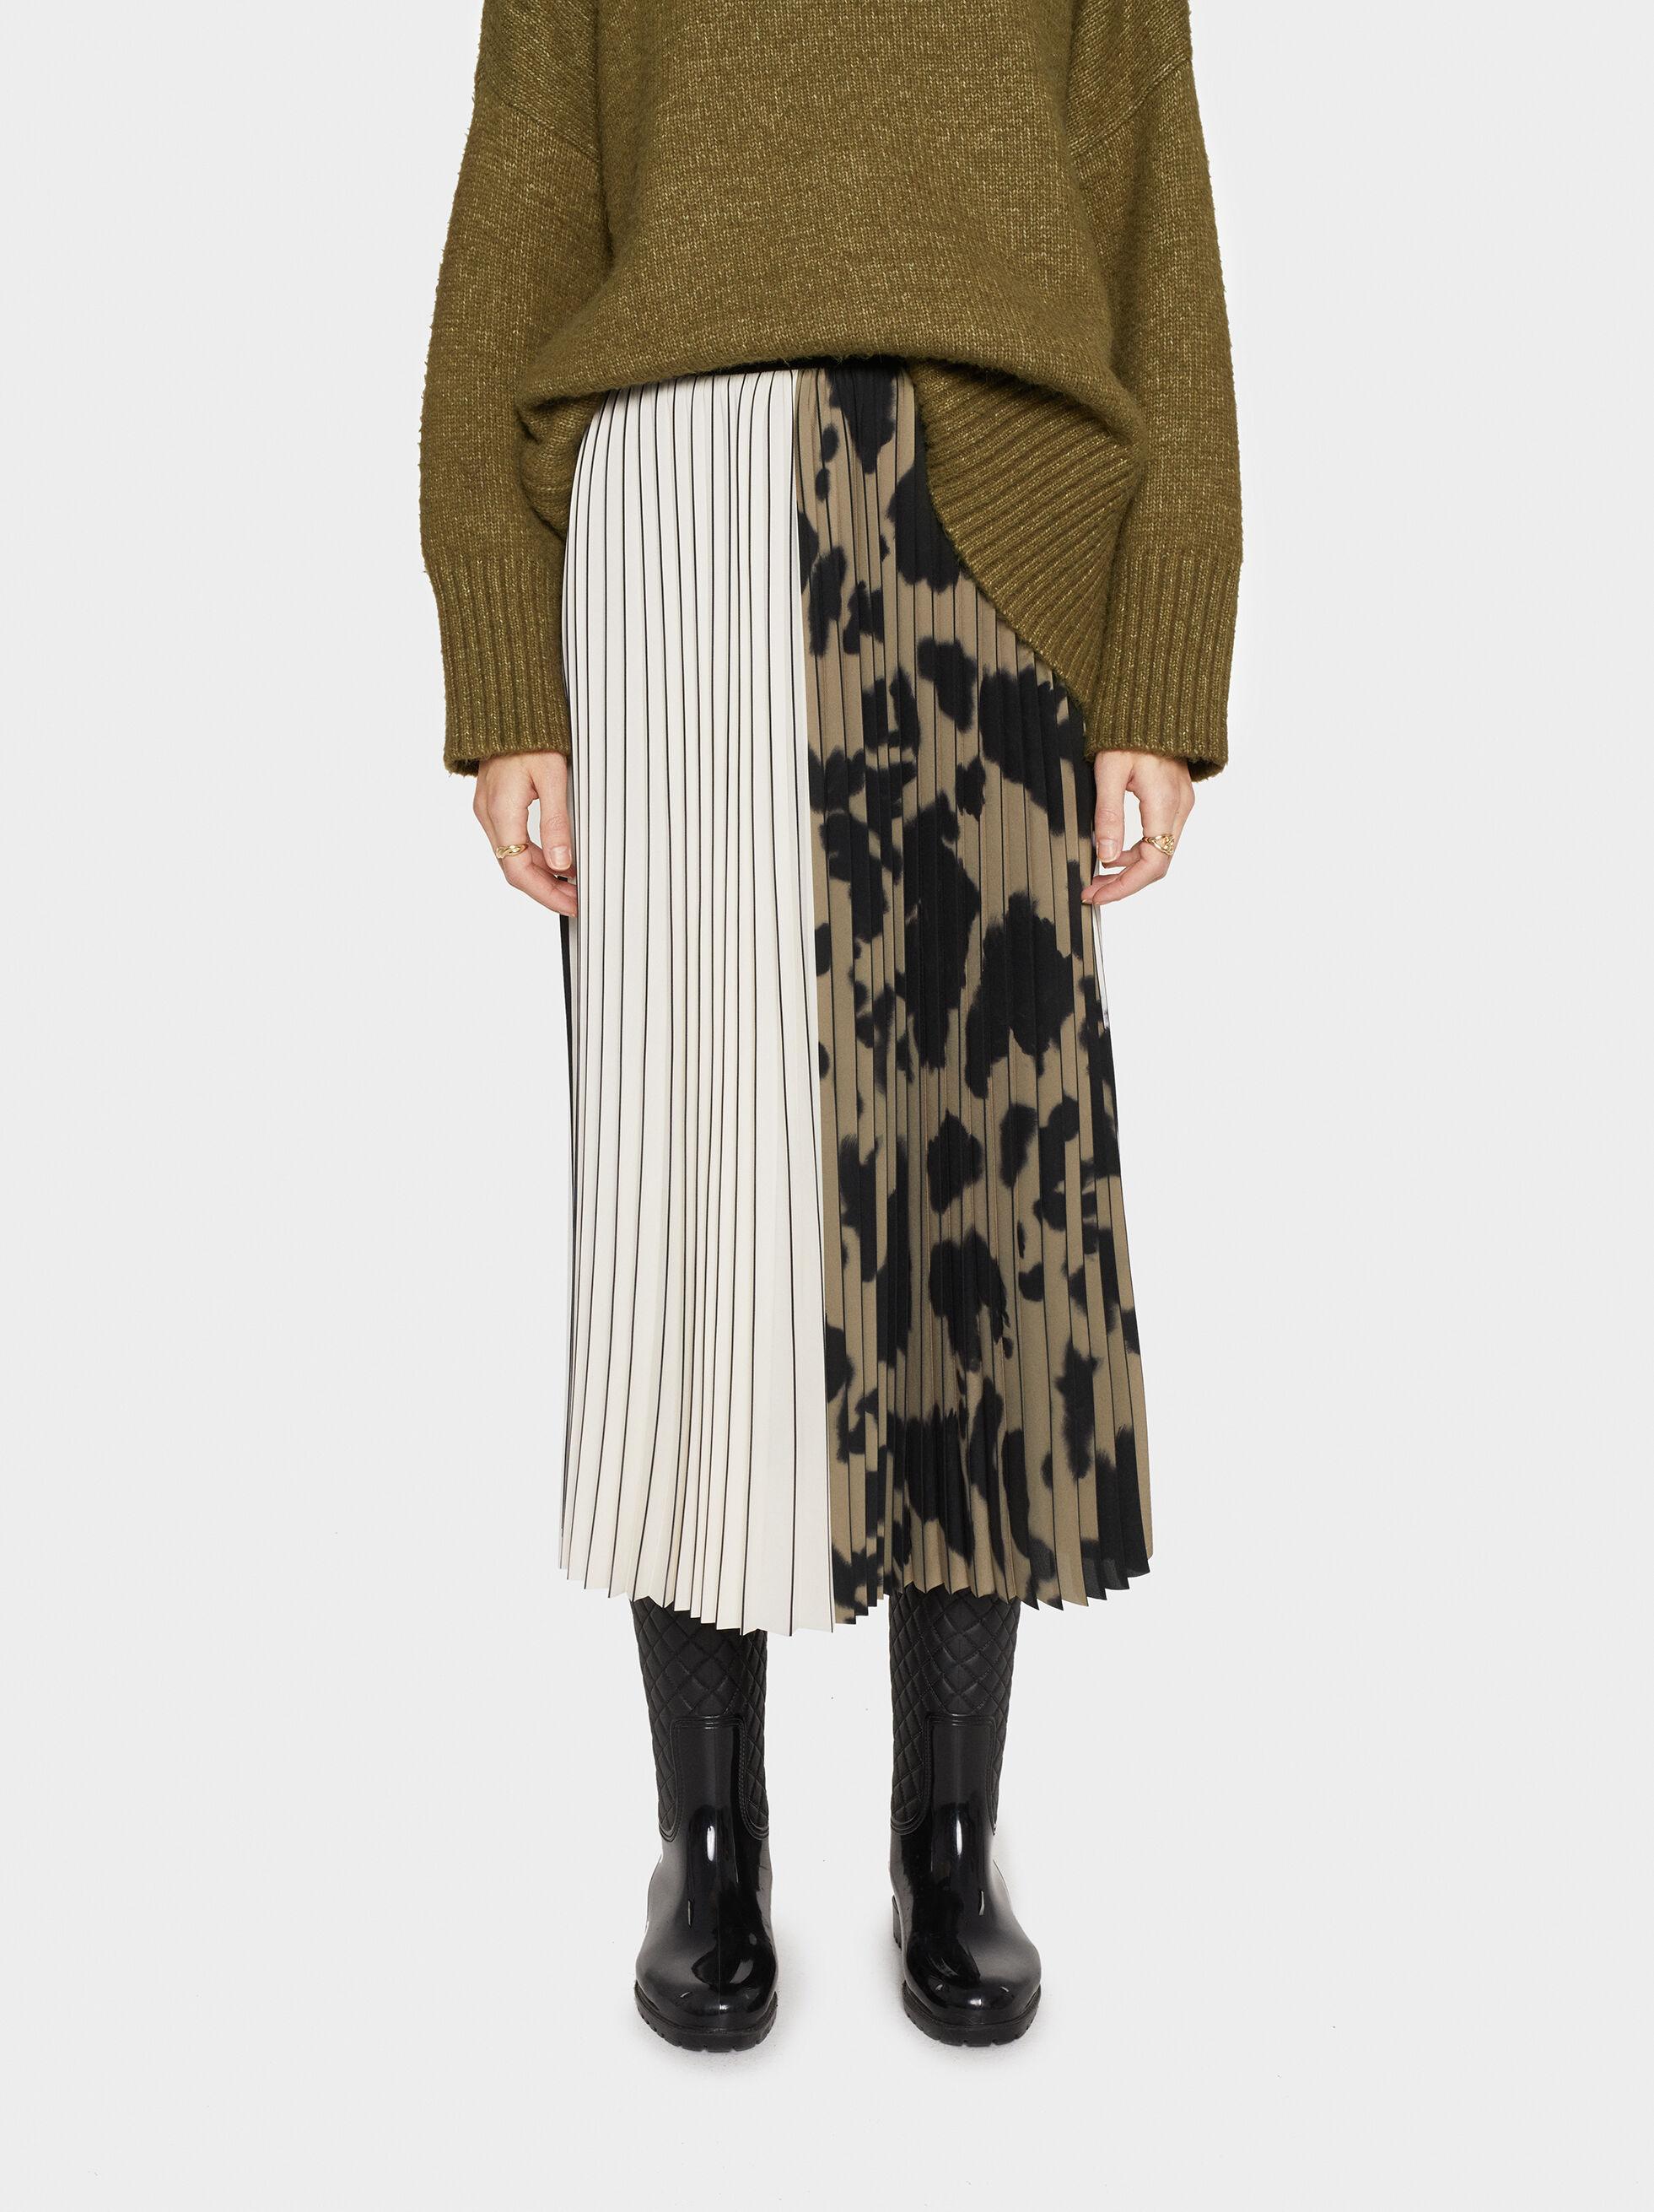 Printed Pleated Skirt, Black, hi-res